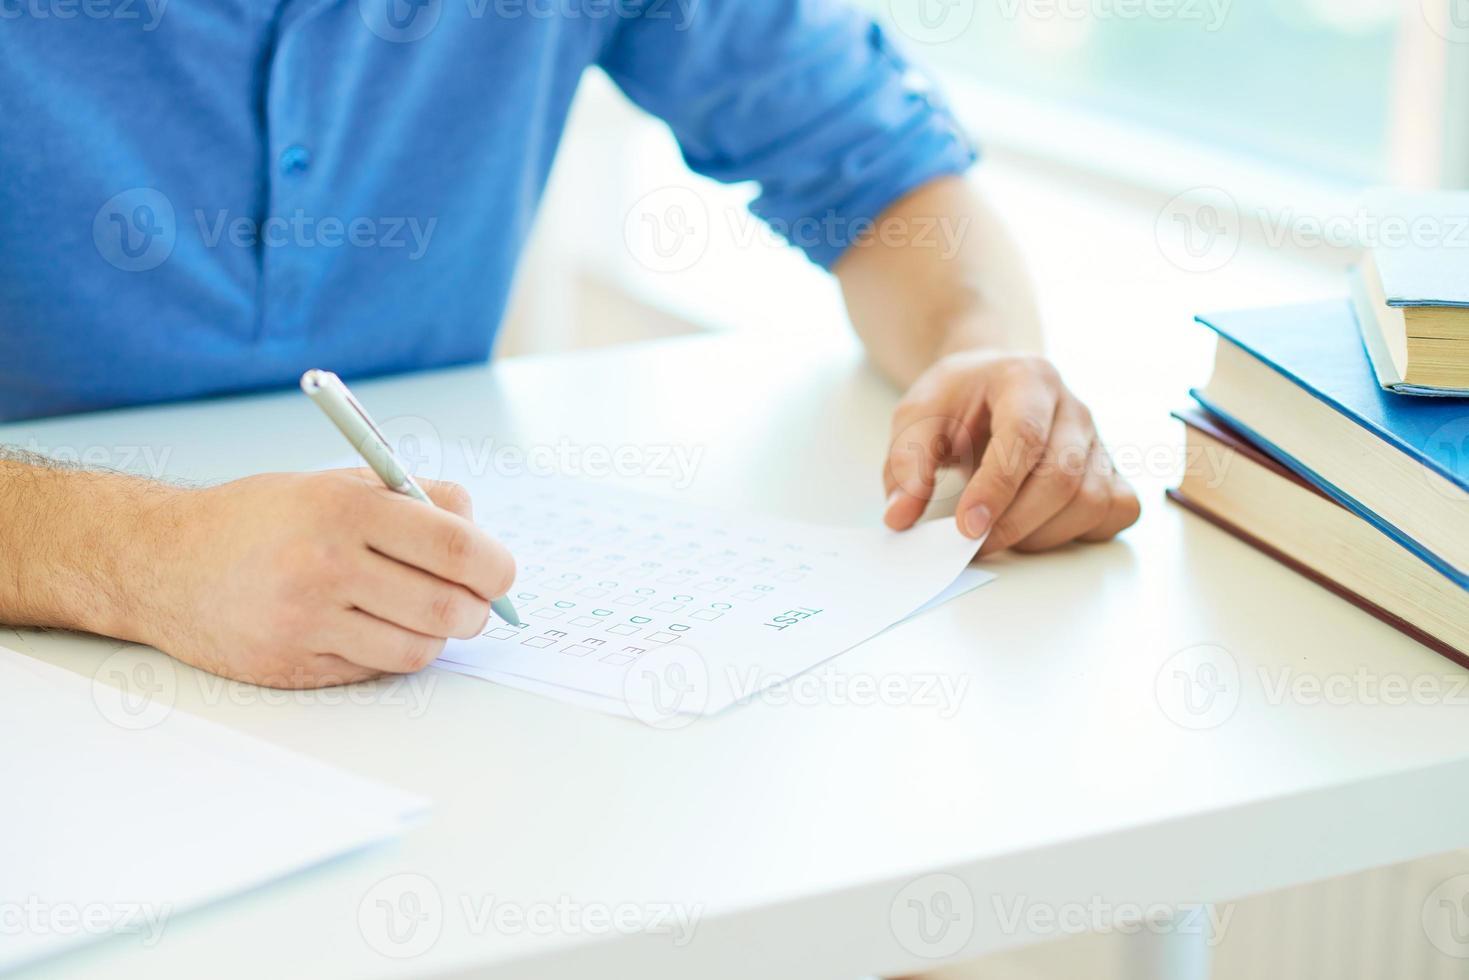 cursus test schrijven foto